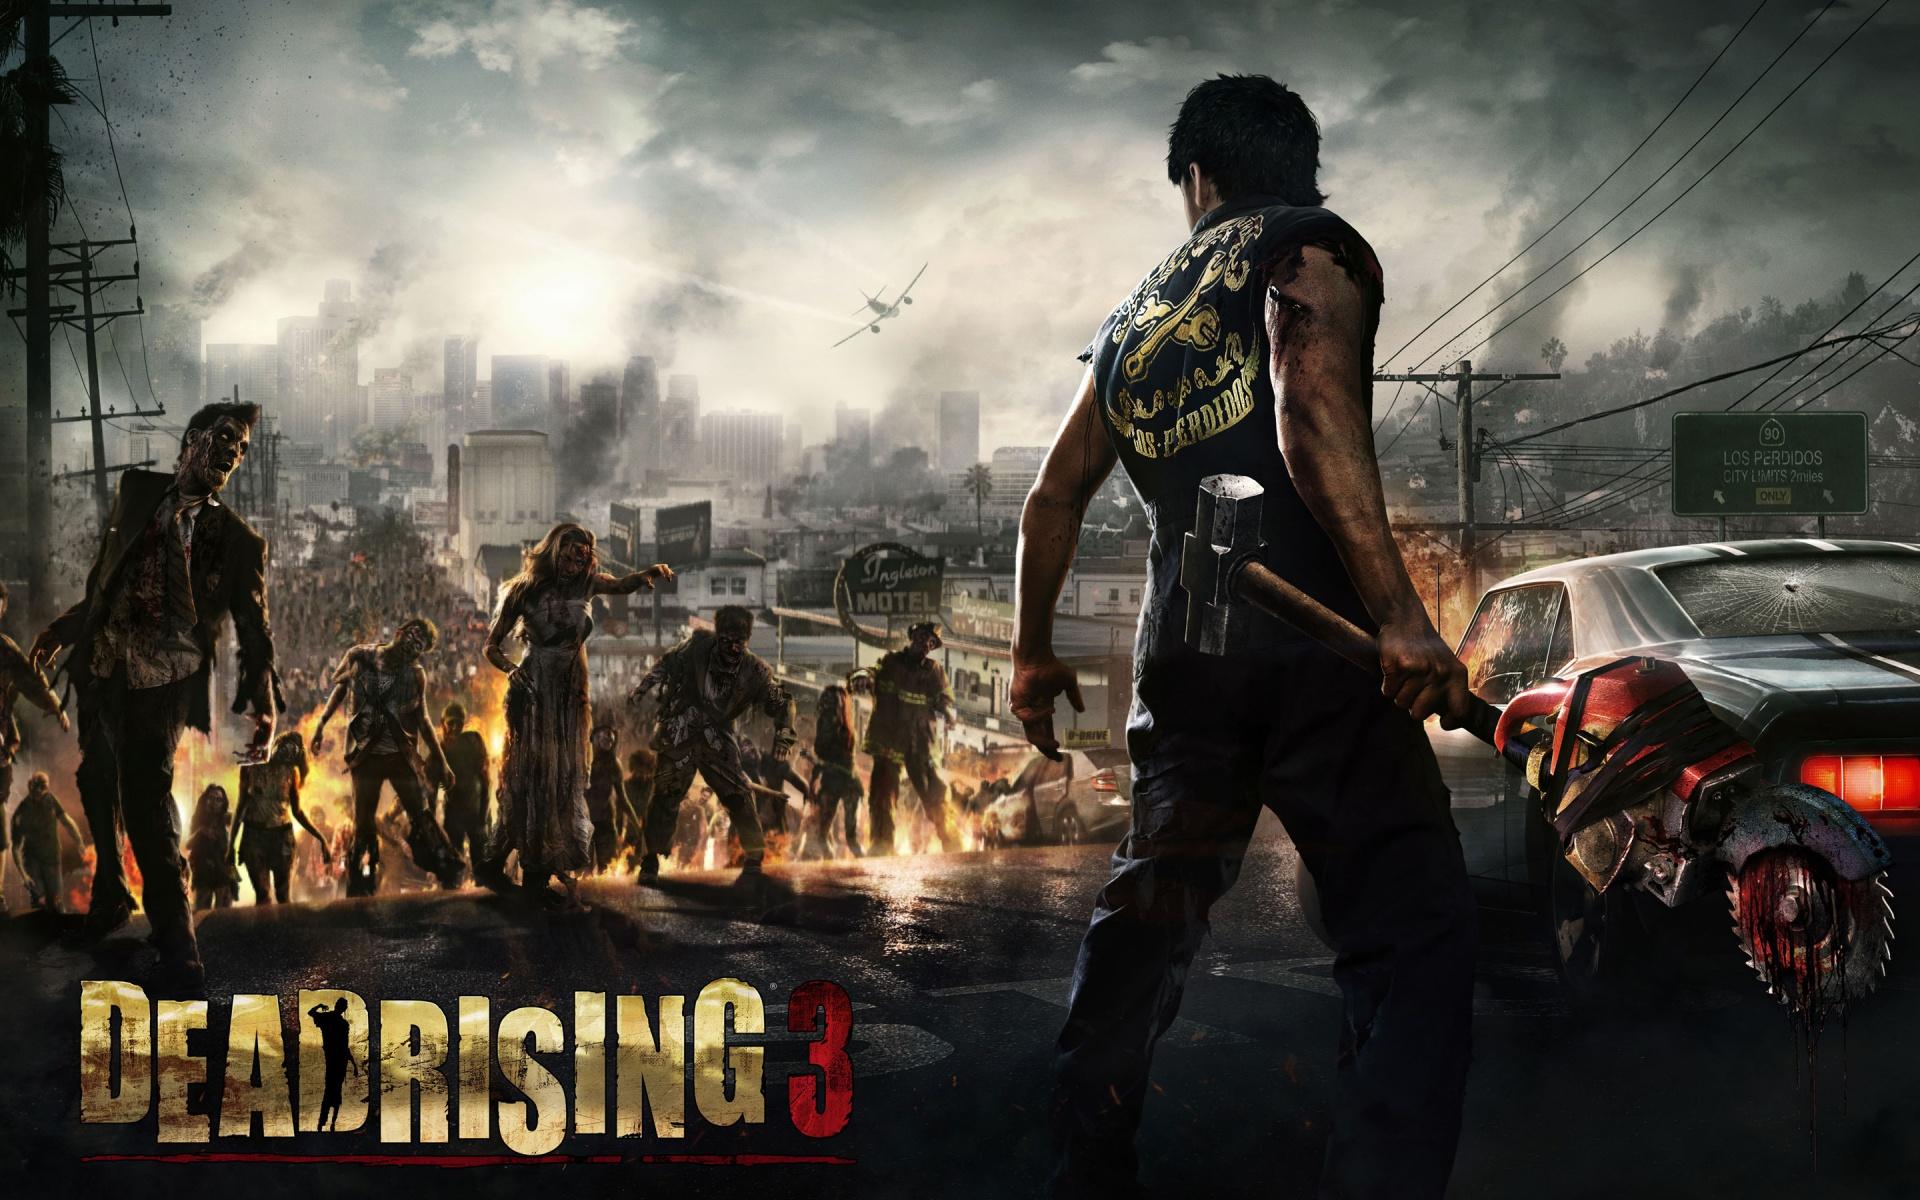 Dead-Rising-3-Game-1920x1200